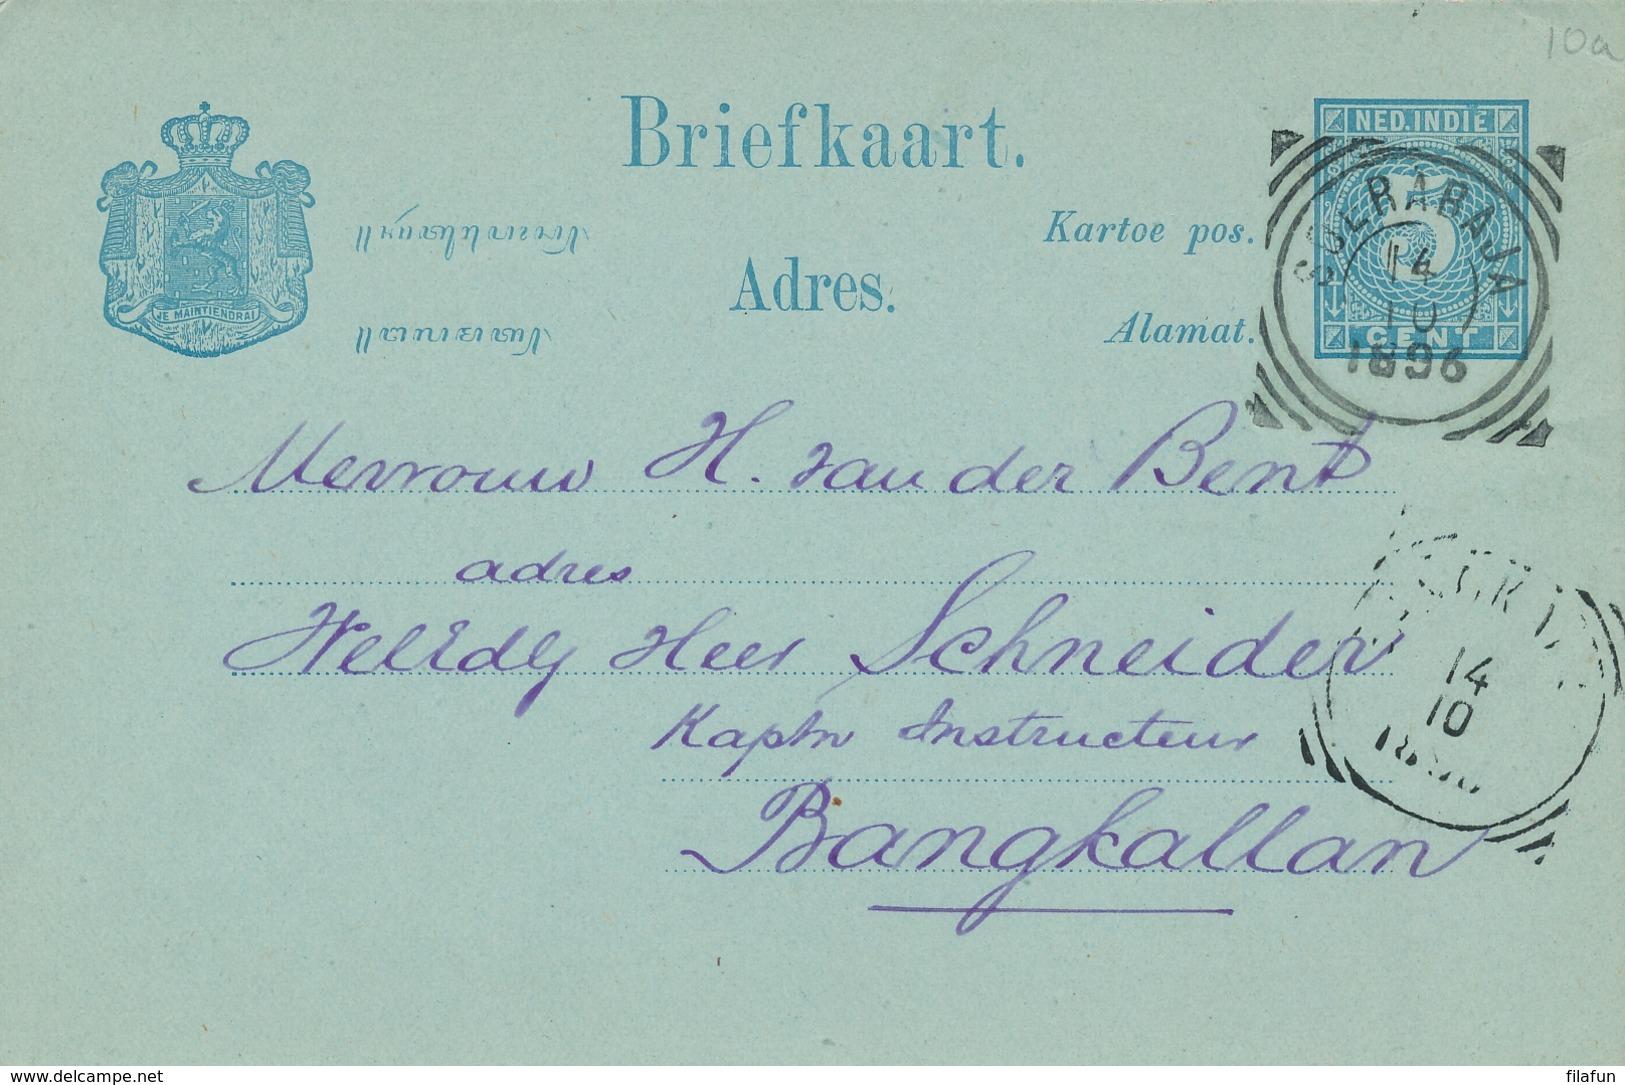 Nederlands Indië - 1896 - 5 Cent Cijfer, Briefkaart G10 Van VK Soerabaja Naar VK Bangkalan - Nederlands-Indië